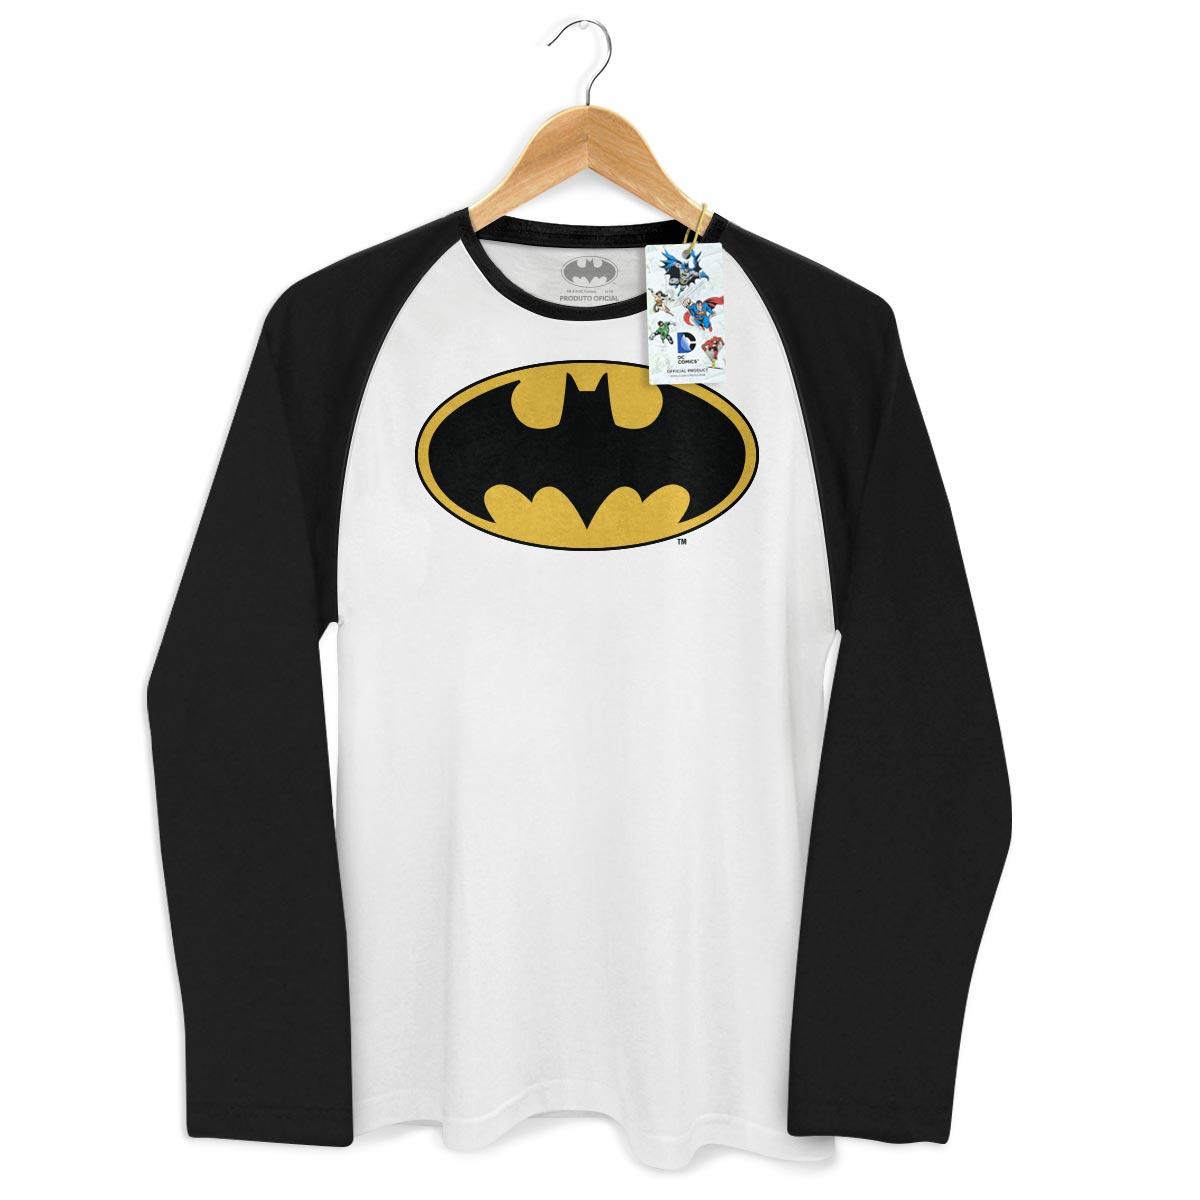 Camiseta Manga Longa Raglan Masculina Batman Logo Clássico